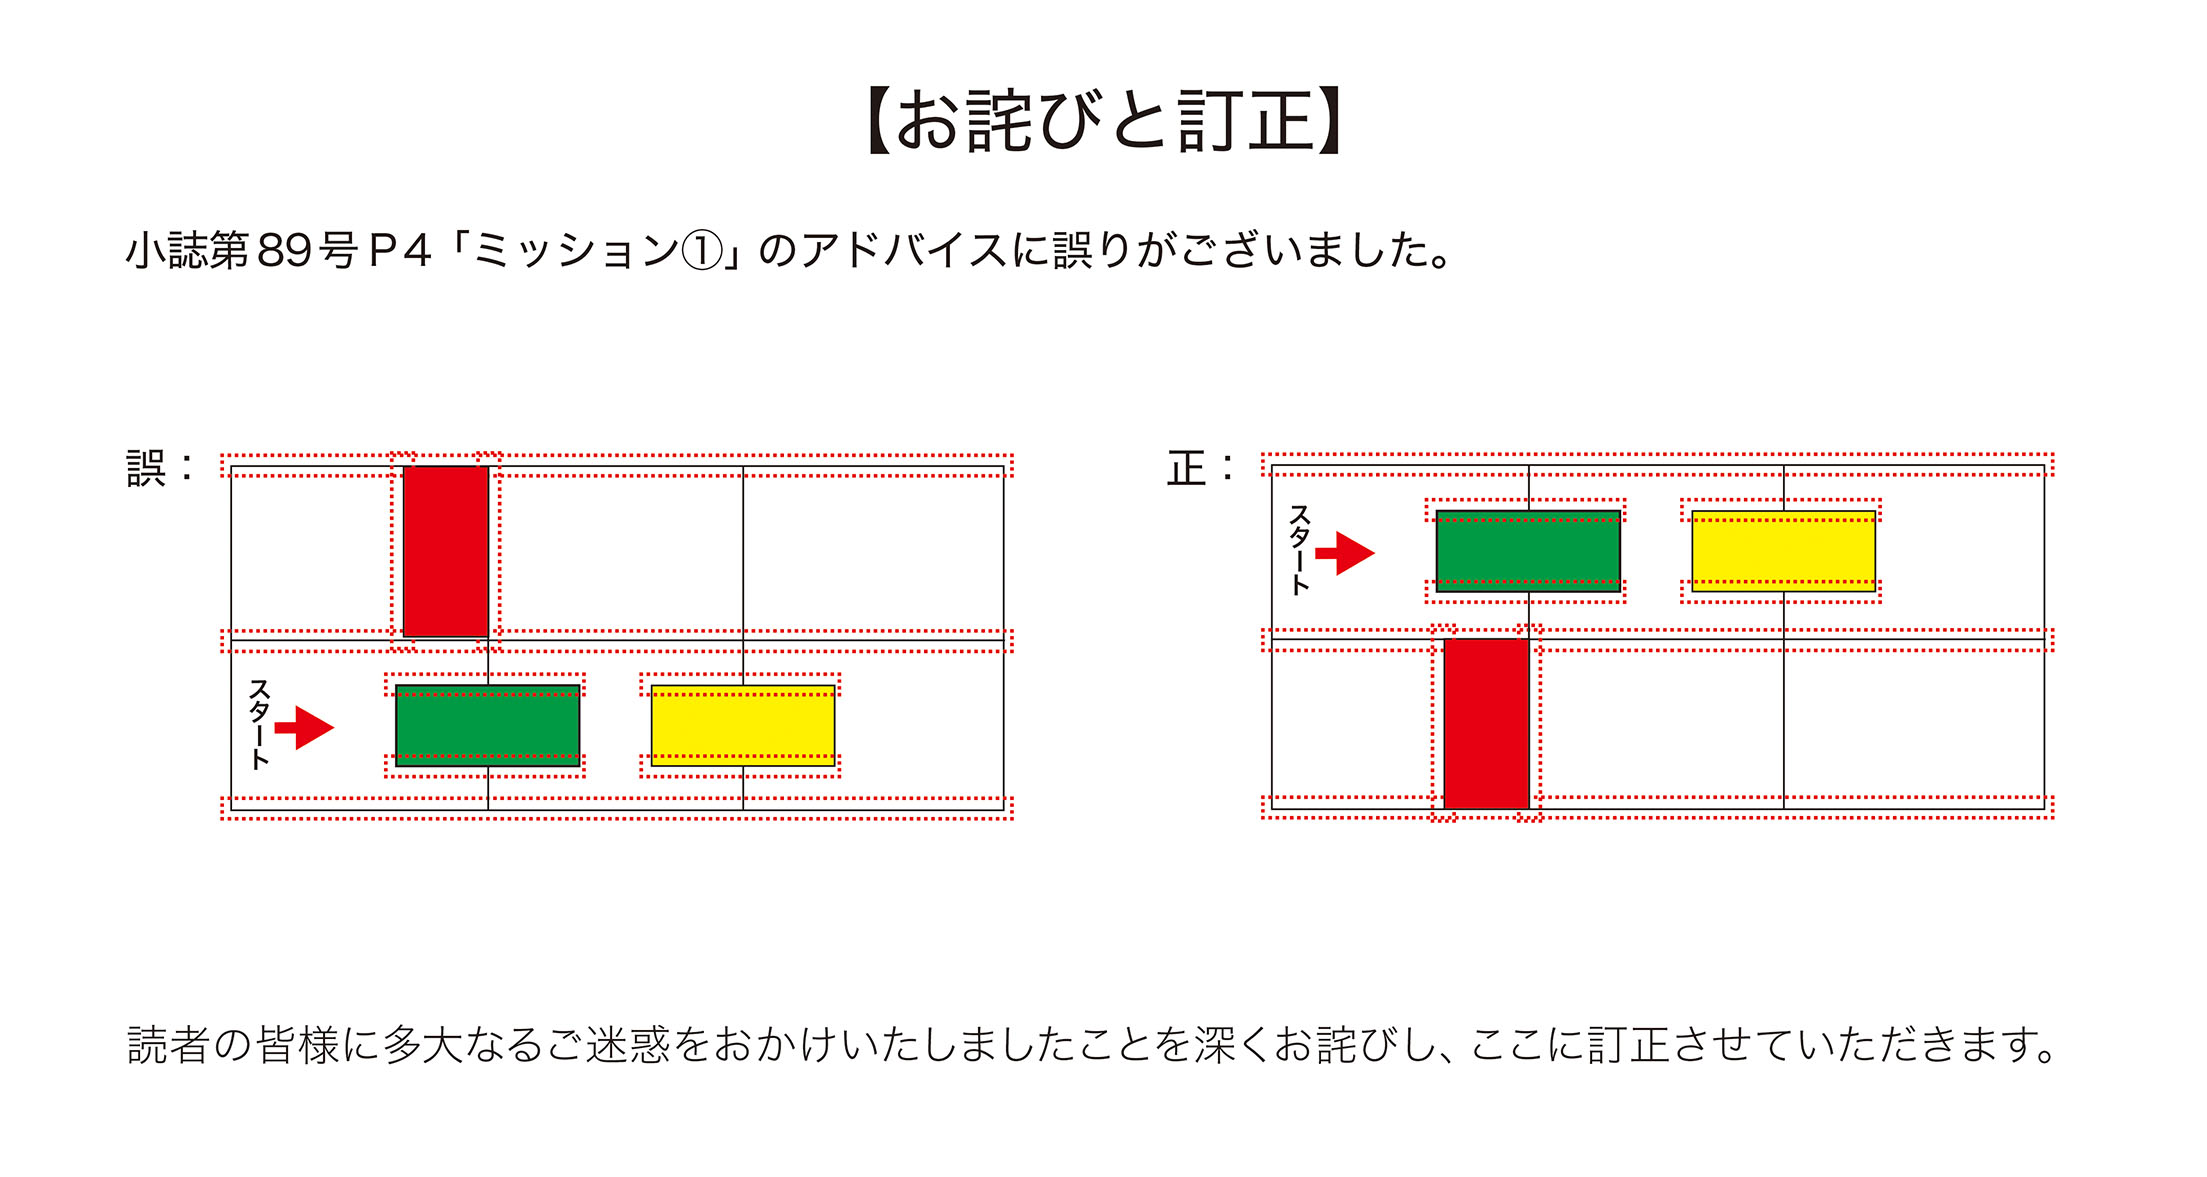 KR2_089_お詫びと訂正_0508.jpg